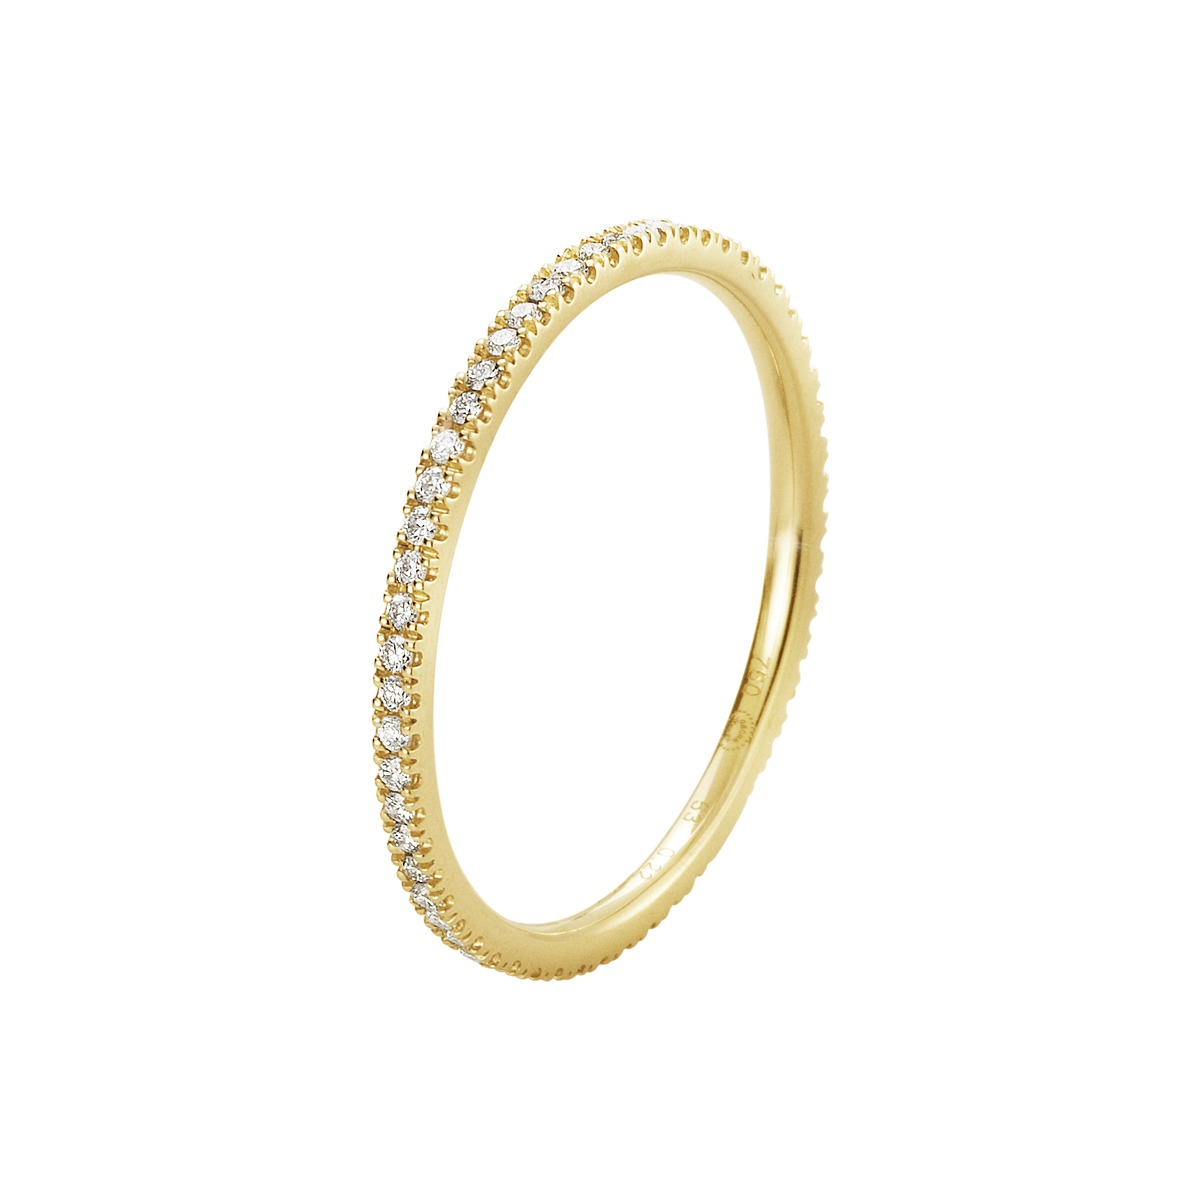 Image of   Georg Jensen CLASSIQUE ring - 3571520 Størrelse 54